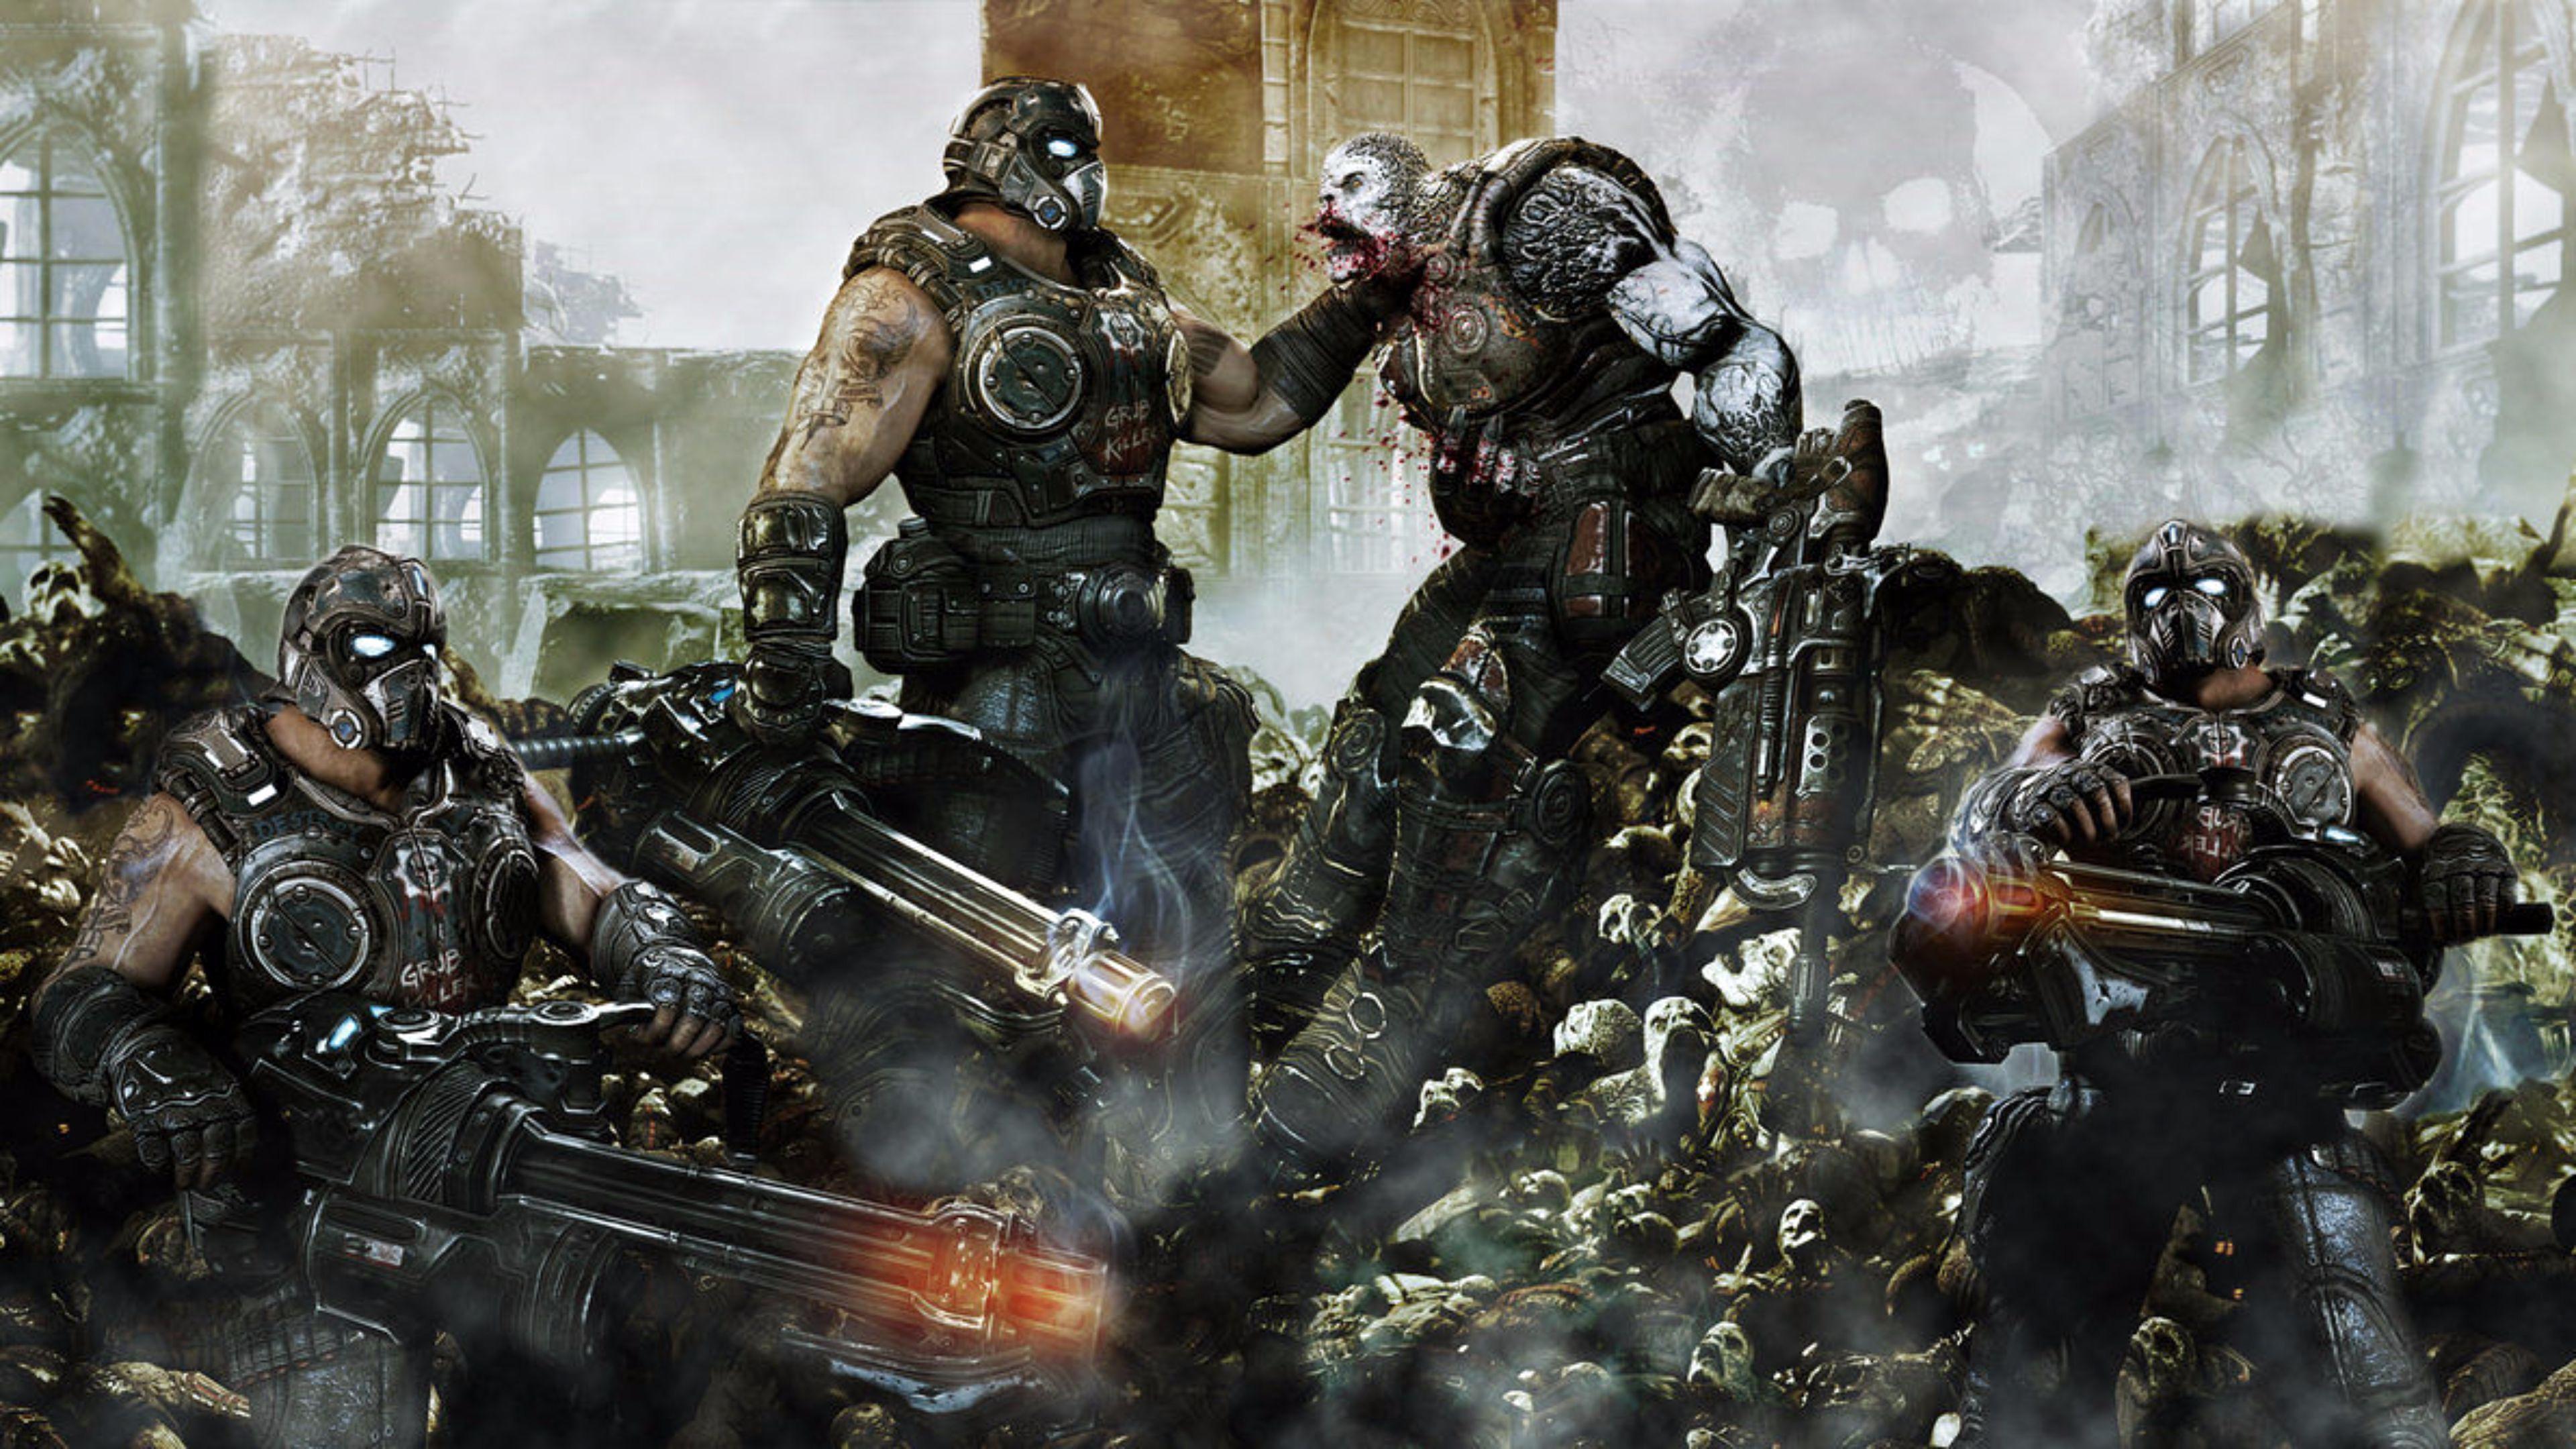 Gears Of War Wallpaper Hd 82 Images